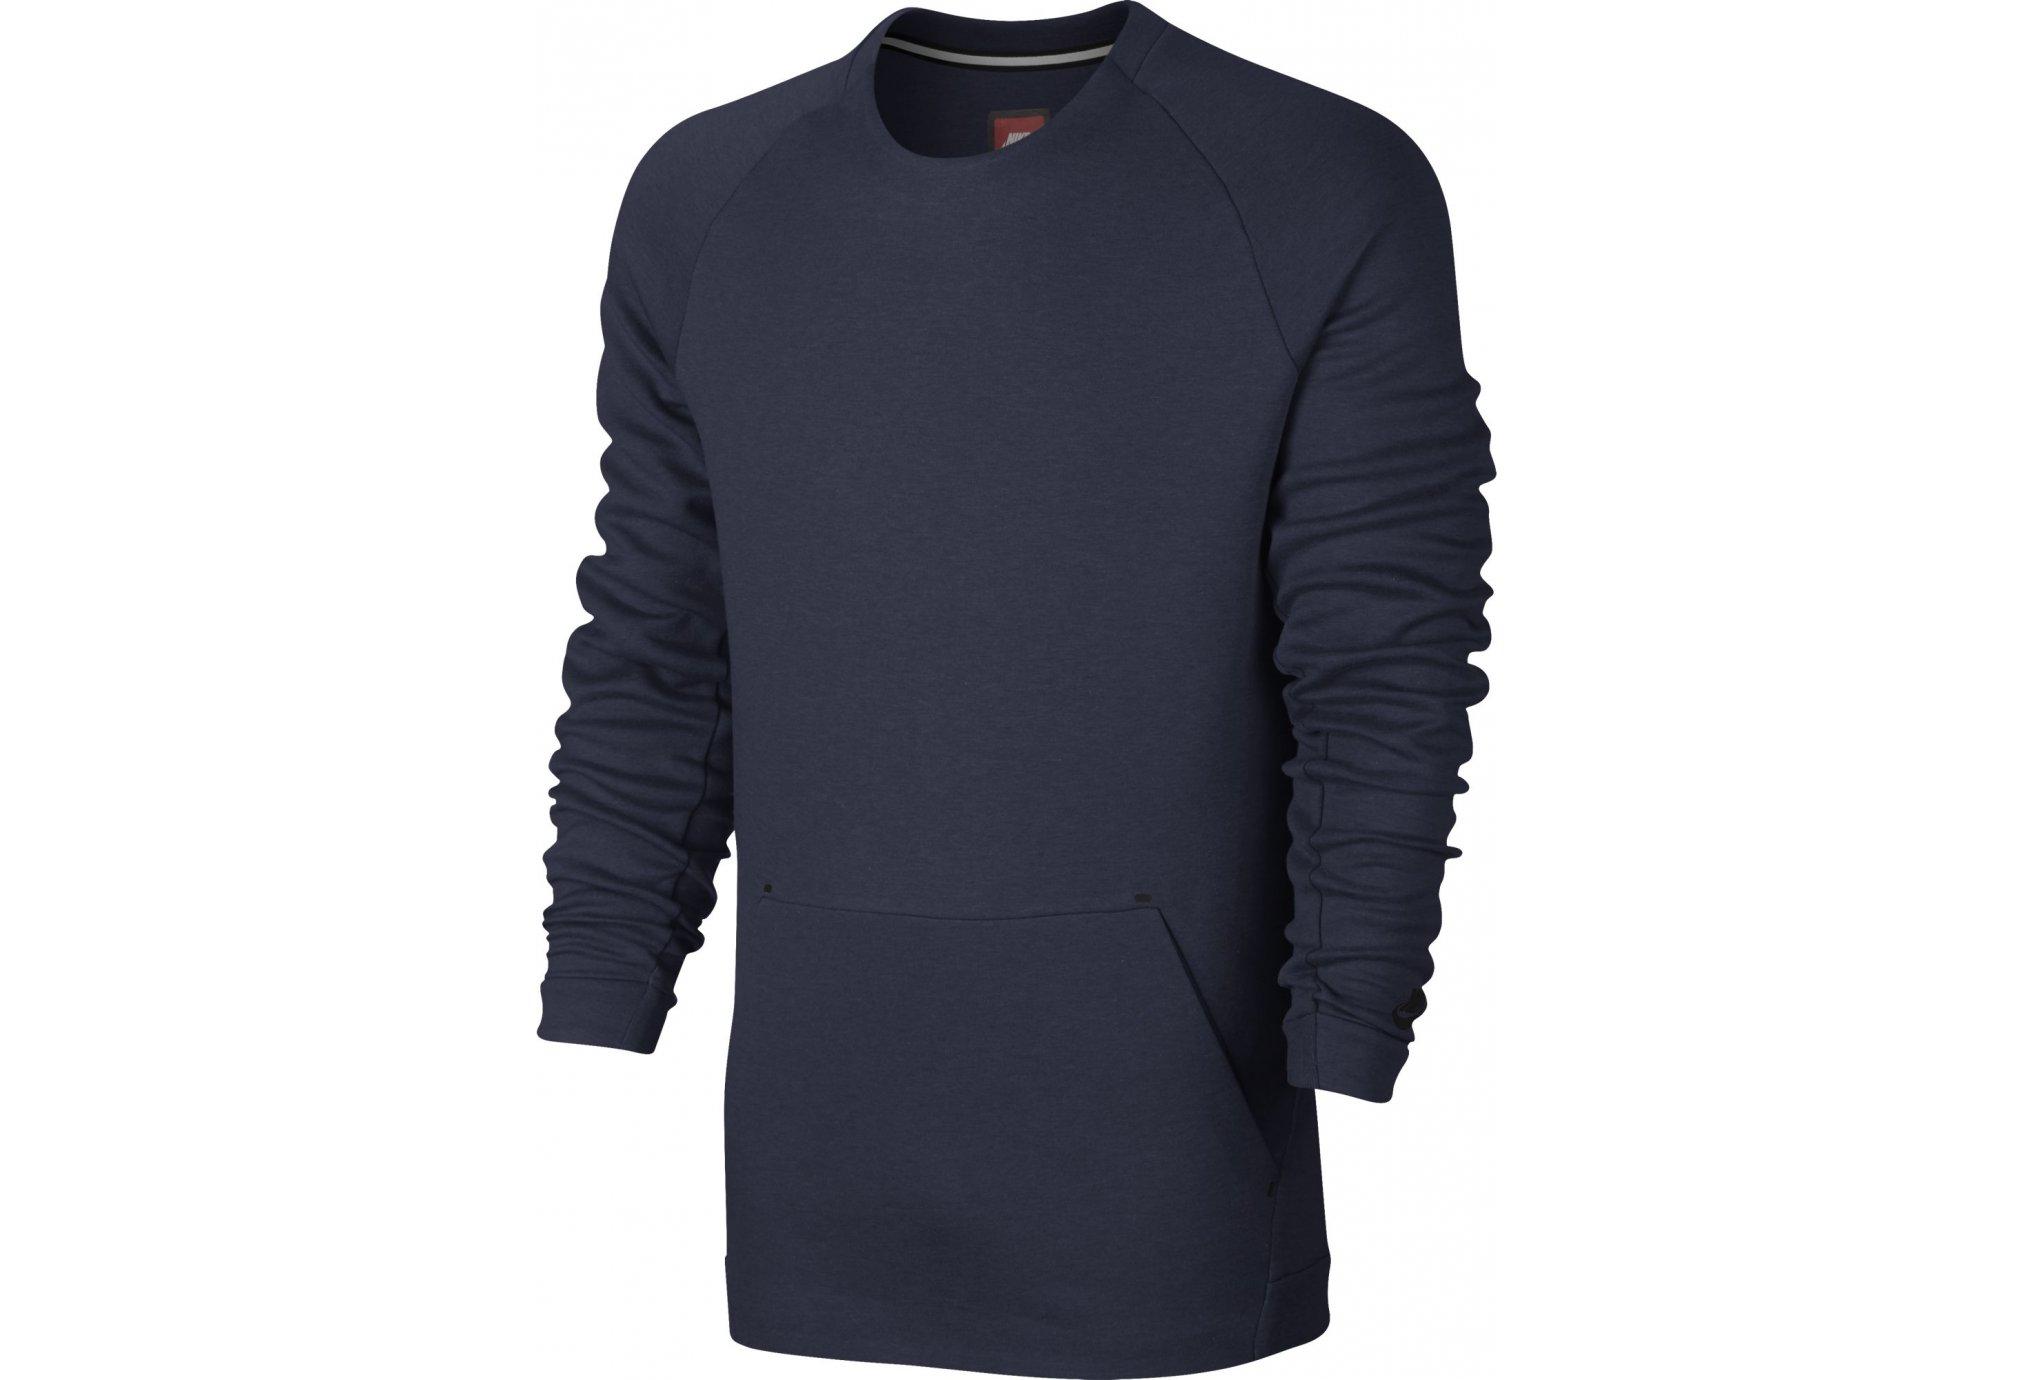 Nike Sportswear Tech Fleece Crew M vêtement running homme